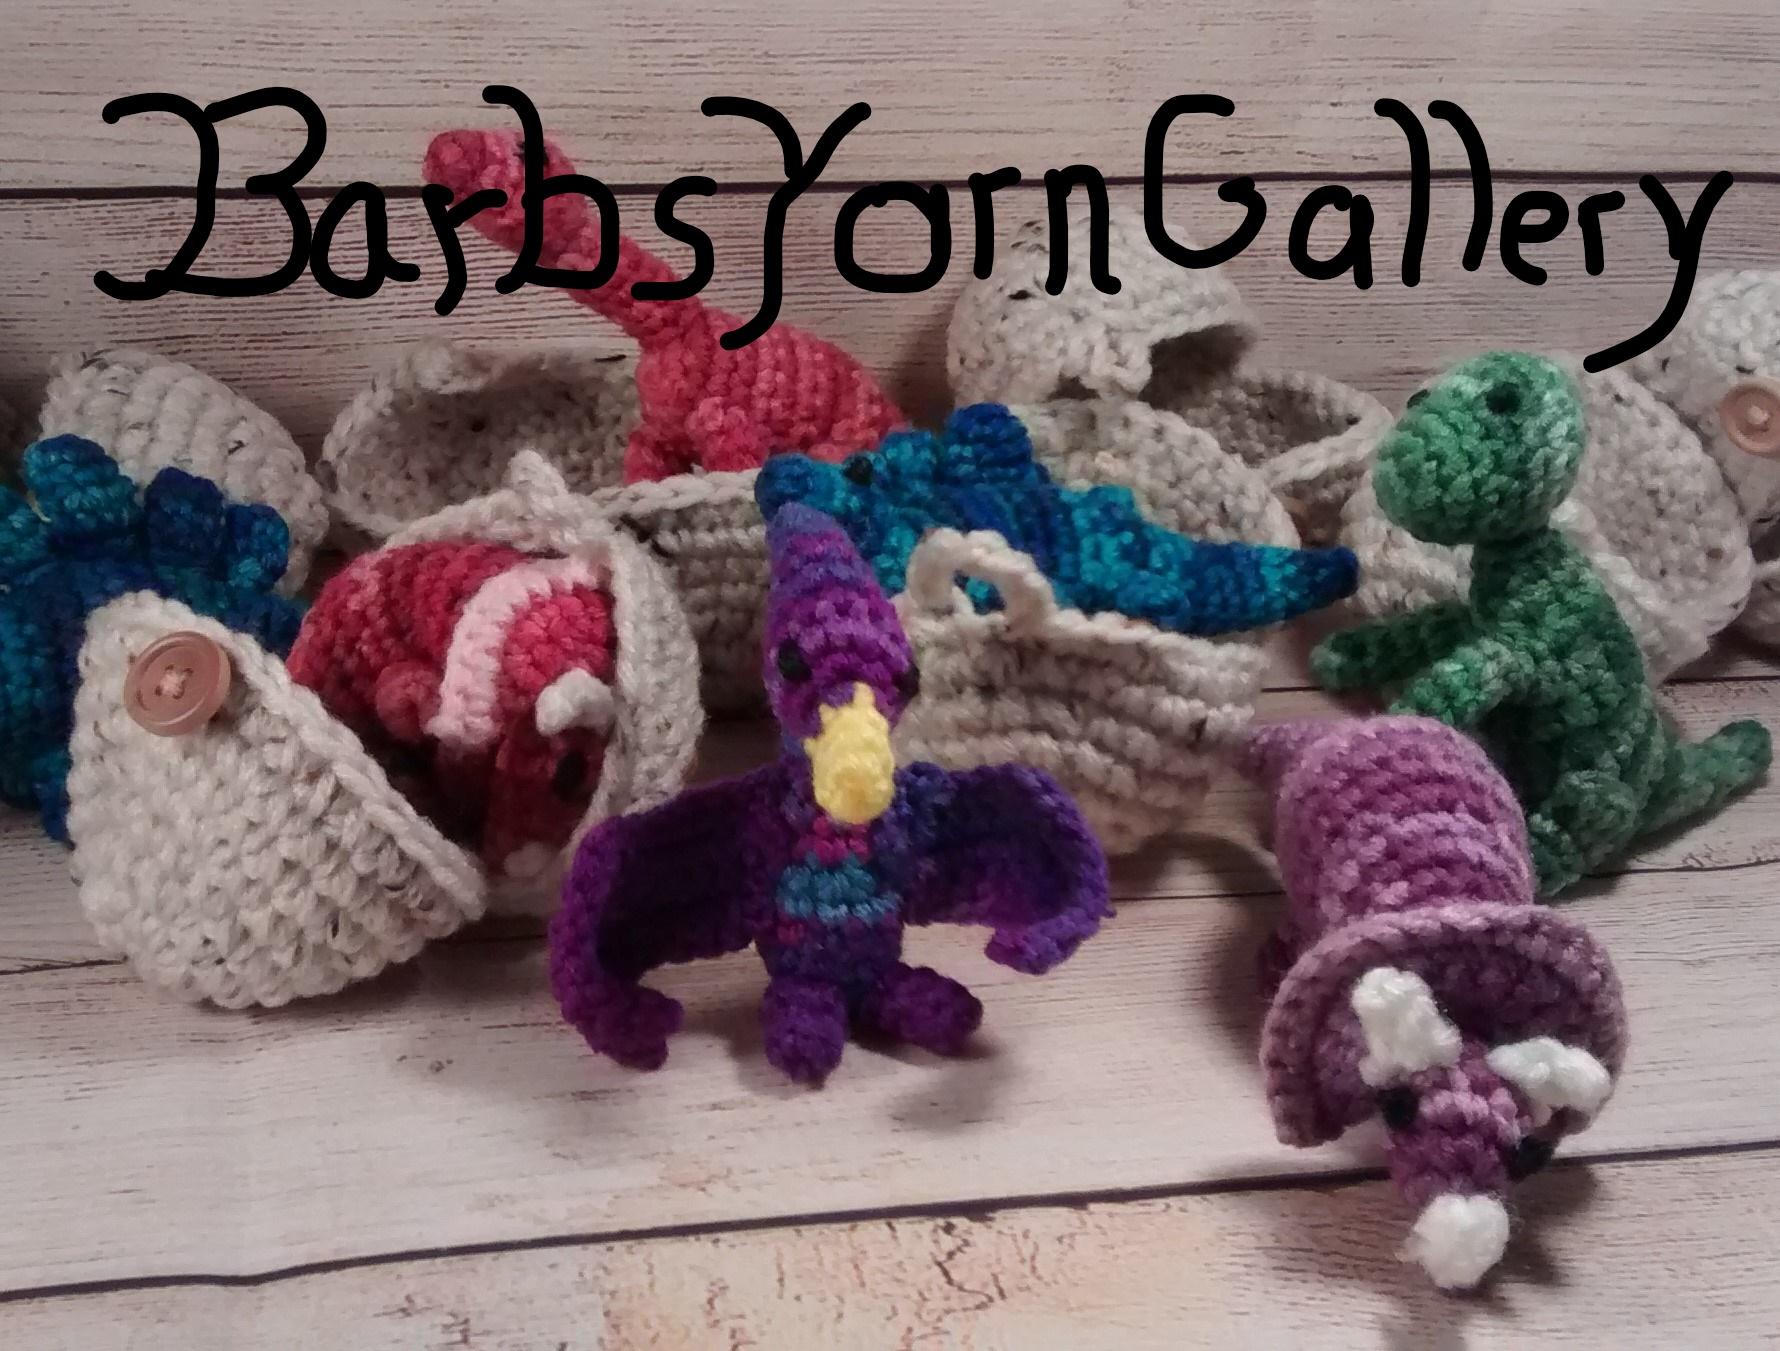 Barbs Yarn Gallery